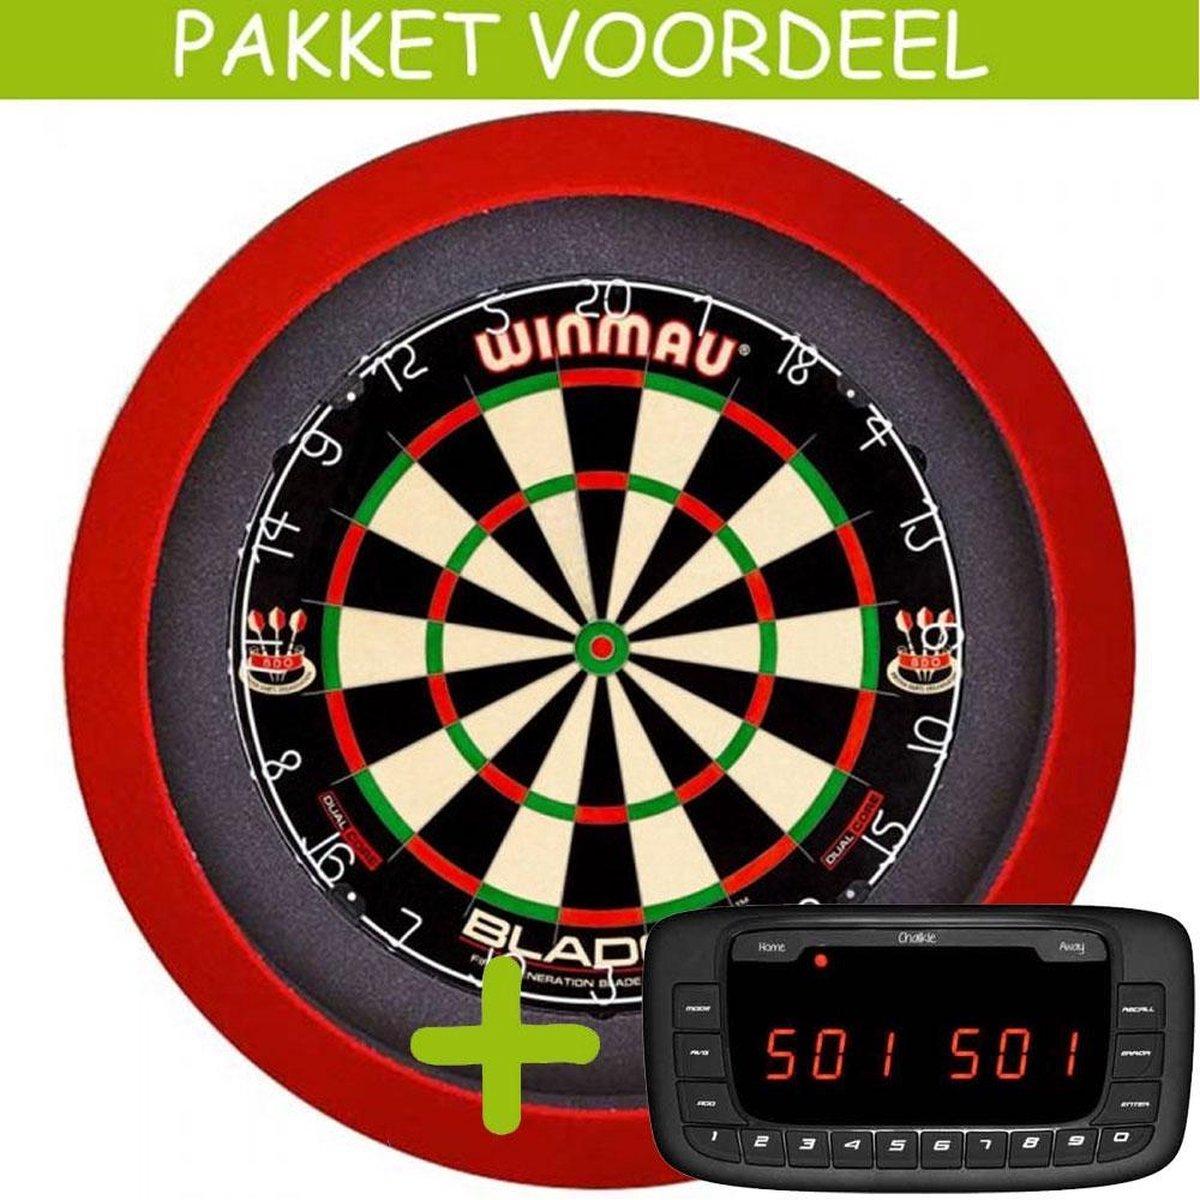 Elektronisch Dart Scorebord VoordeelPakket (Chalkie ) - Dual Core - Dartbordverlichting Basic (Rood)